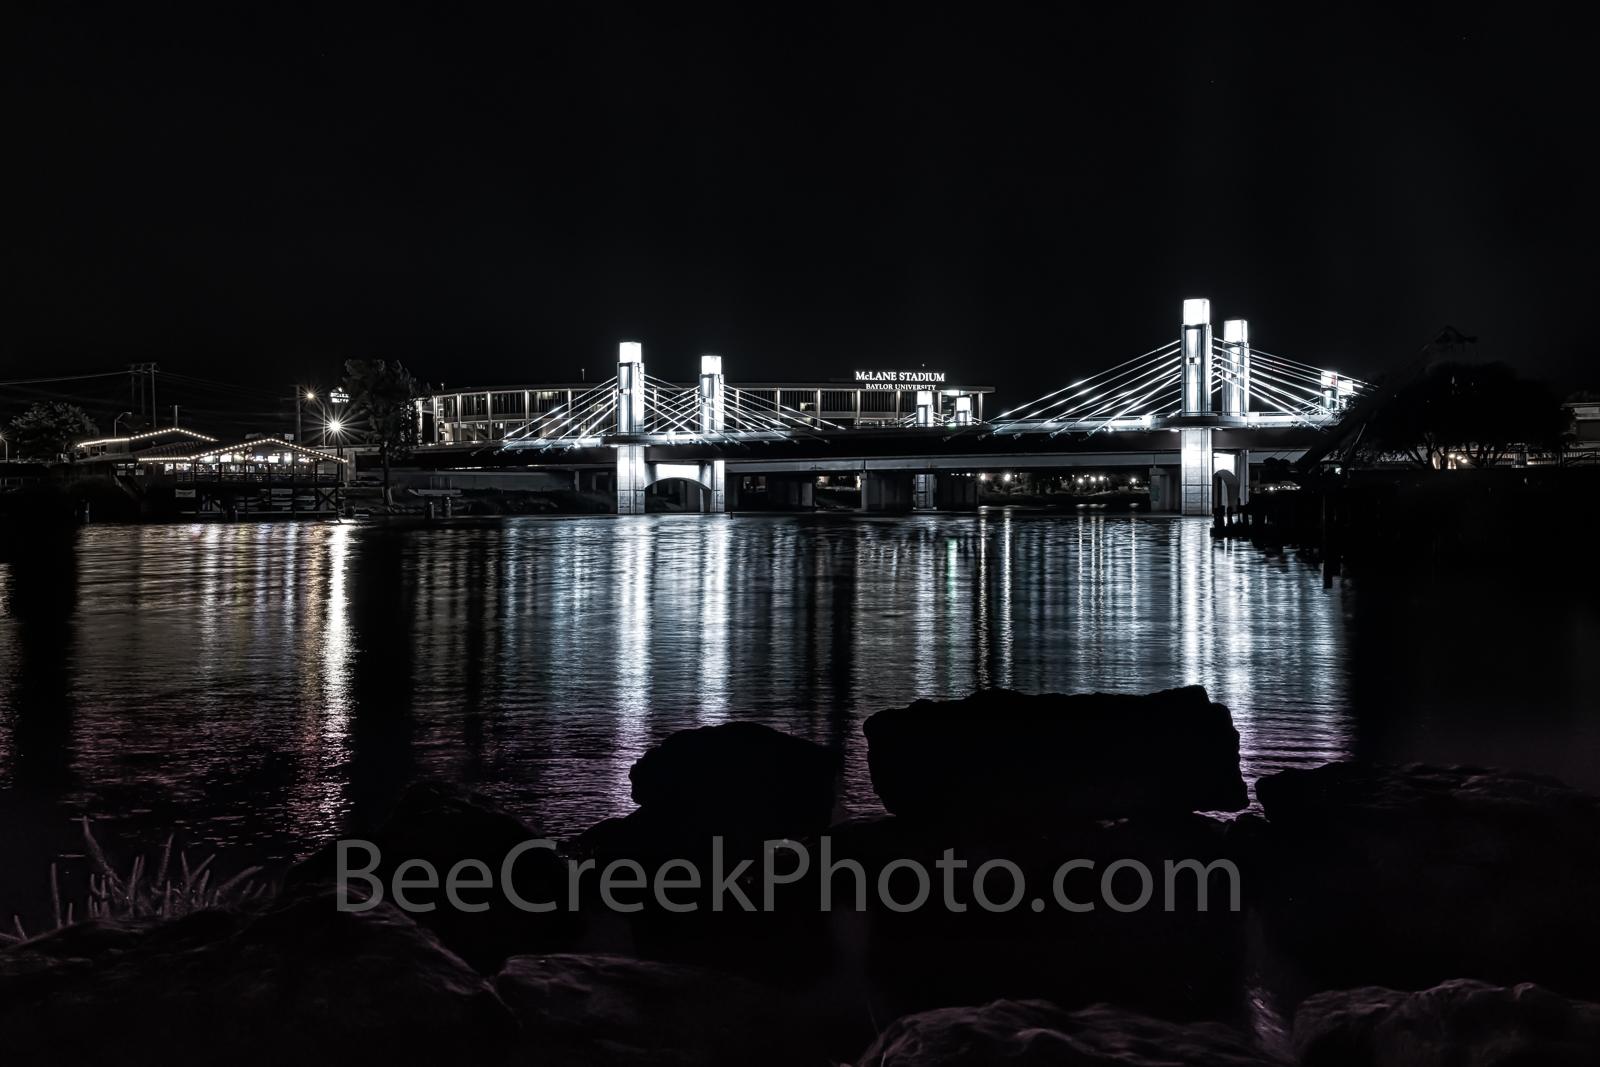 Waco, Brazos River bridge, night, downtown, IH35 stay bridge, lights, texas, Jack Kultgen Freeway, black and white, BW, McLain Stadium, Baylor Univeristy, reflected, reflection, buzzard Billys,, photo